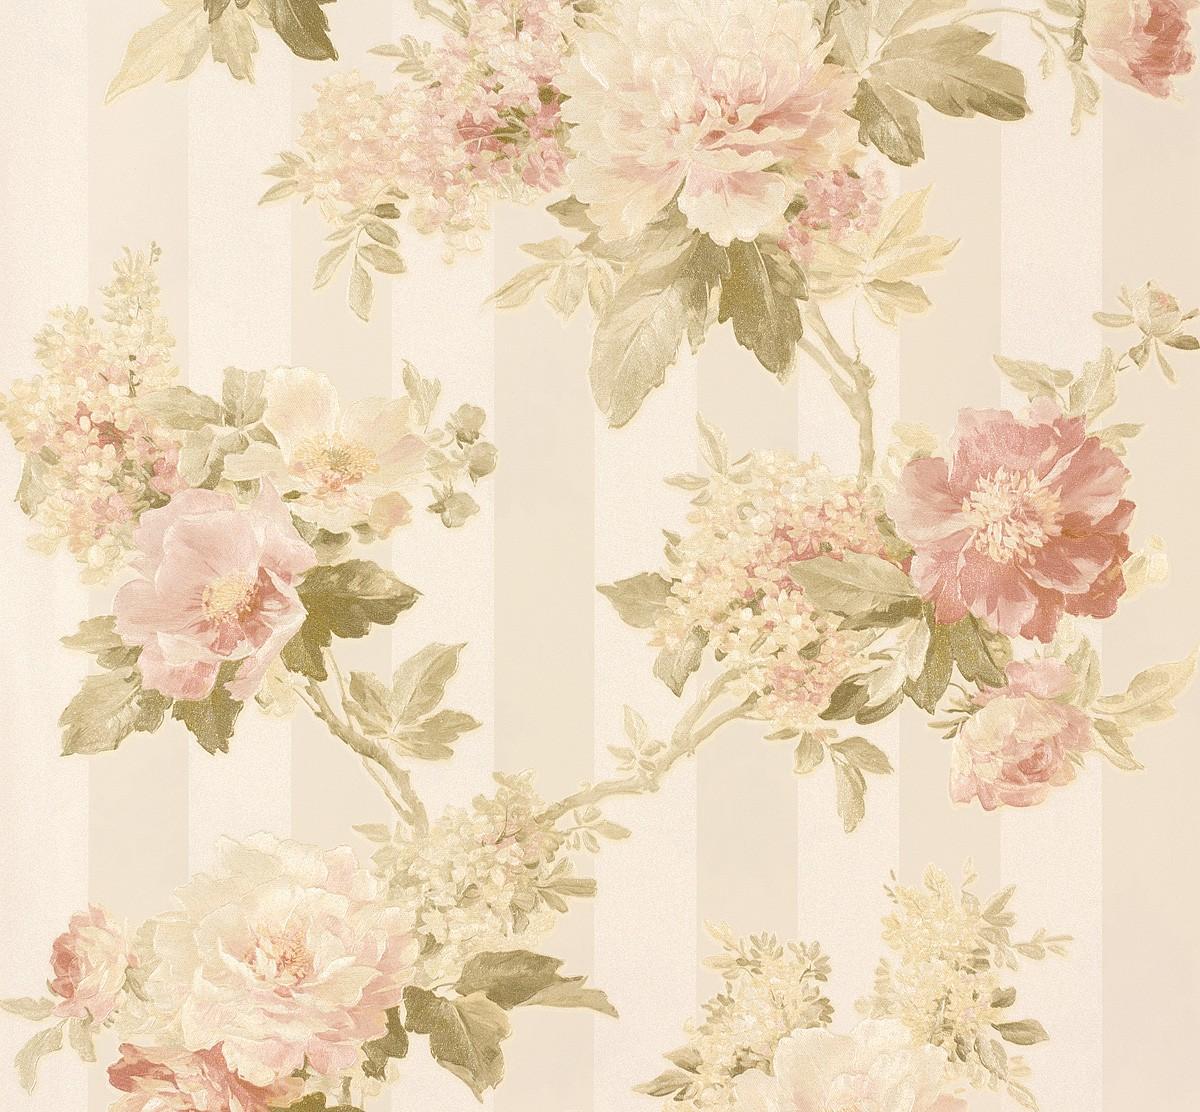 tapete romantica blumen creme gr n as creation 30446 1. Black Bedroom Furniture Sets. Home Design Ideas